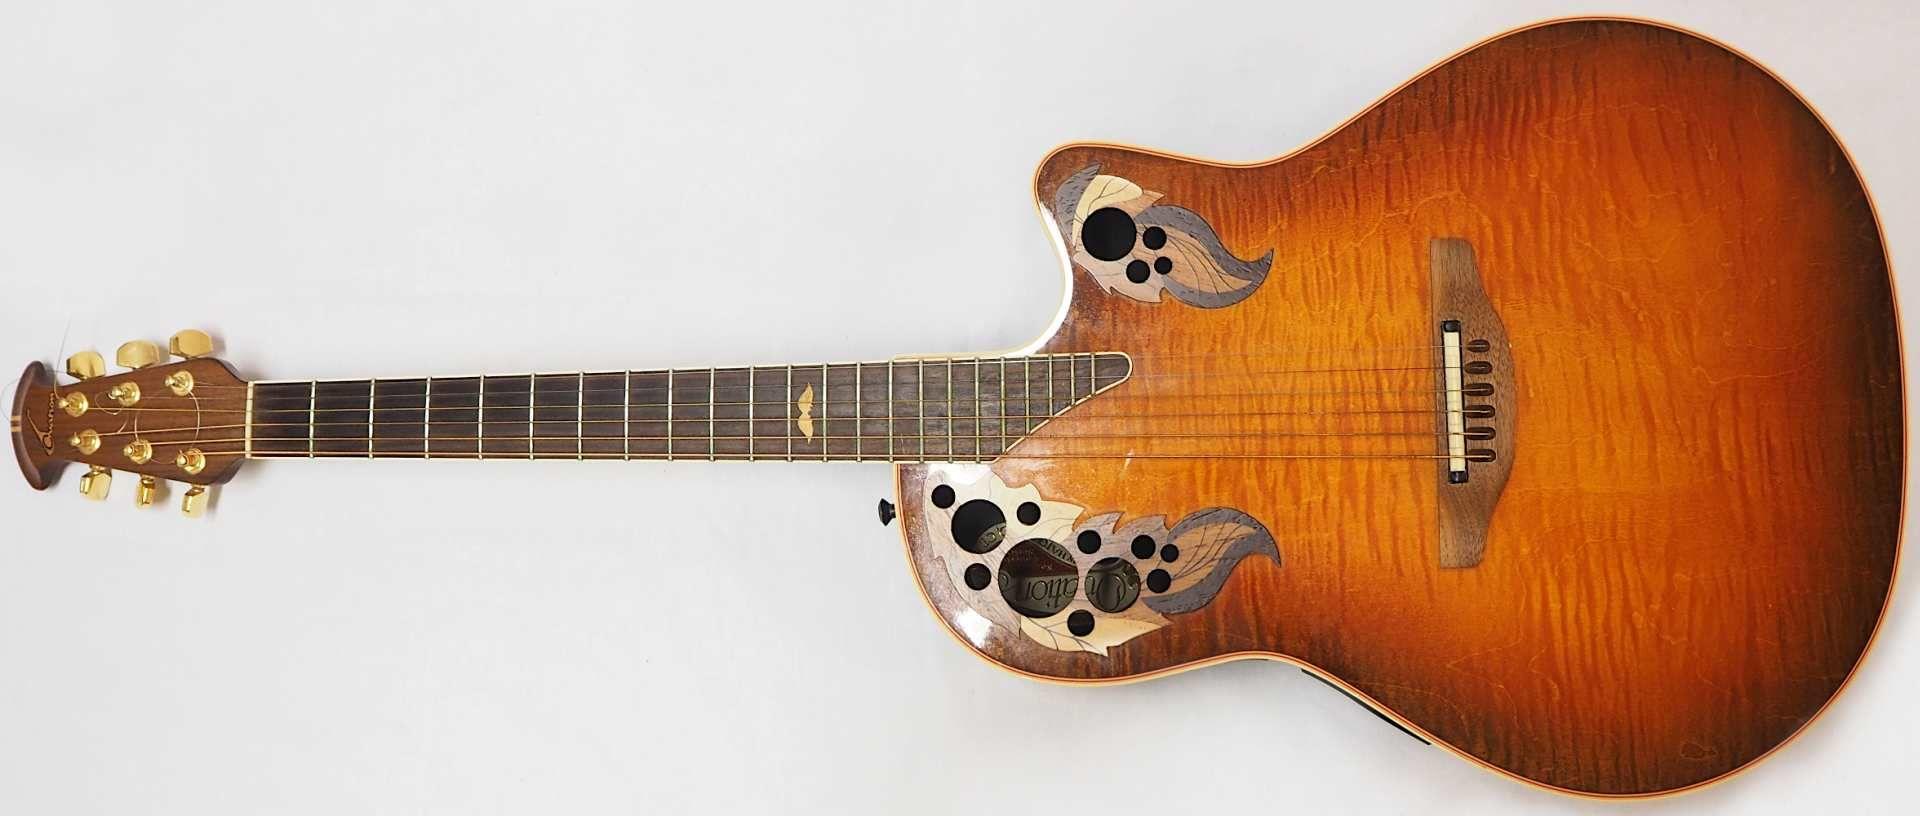 "1 Akustikgitarre OVATION ""Nr. 493 Collector's Series'98, New Hartford, CT./USA"" Holz m - Bild 2 aus 5"